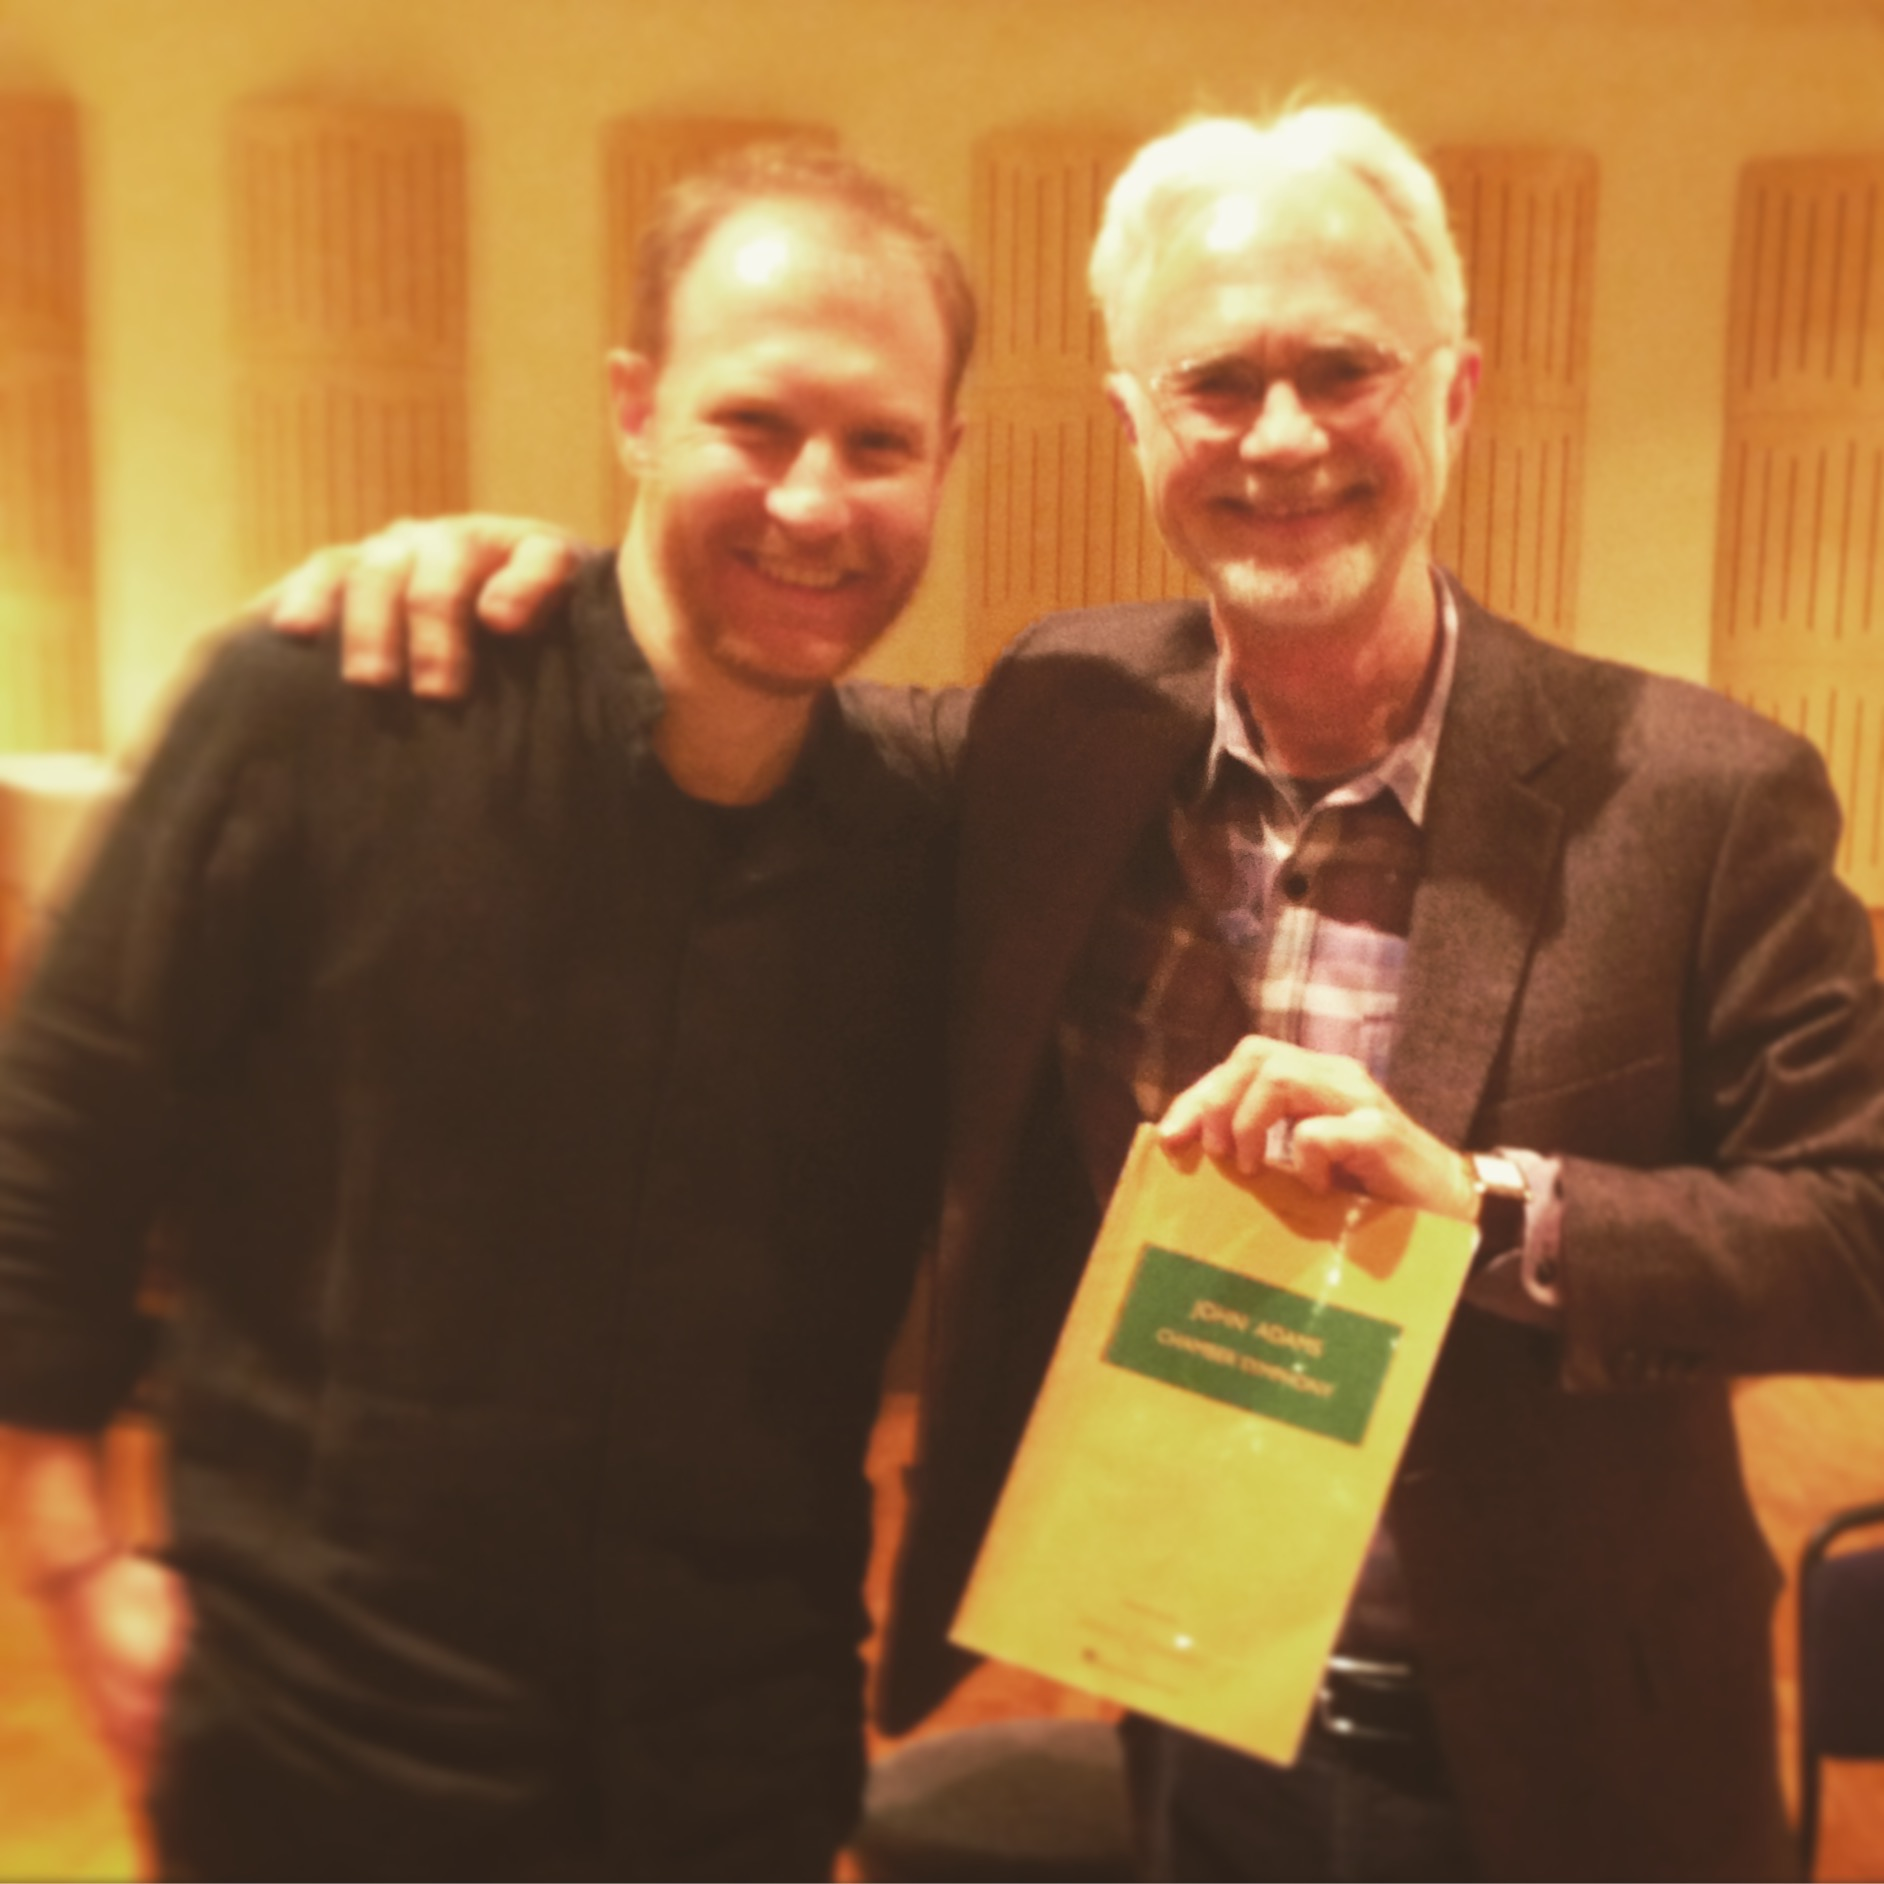 Working with John Adams composer at Konzerthaus Wien